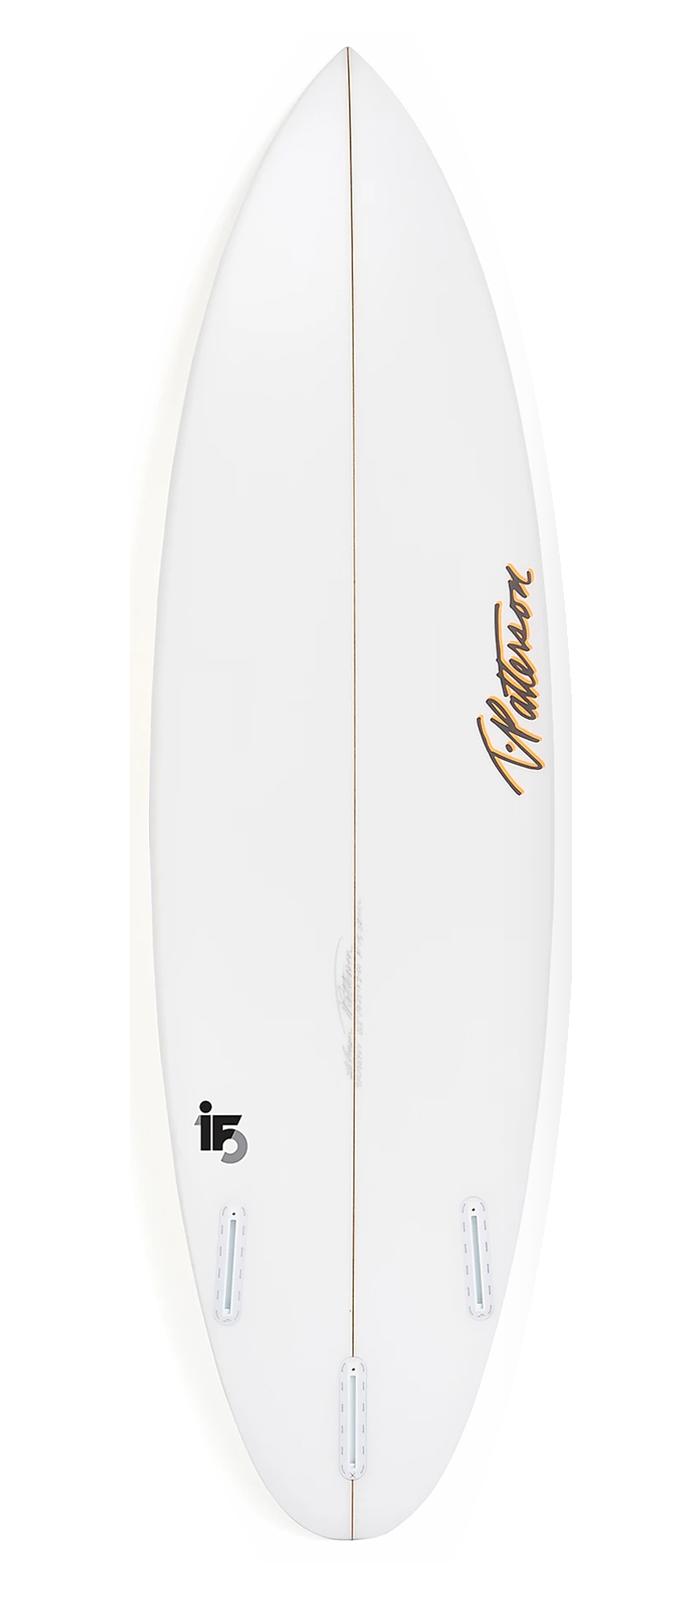 IF-15 surfboard model bottom